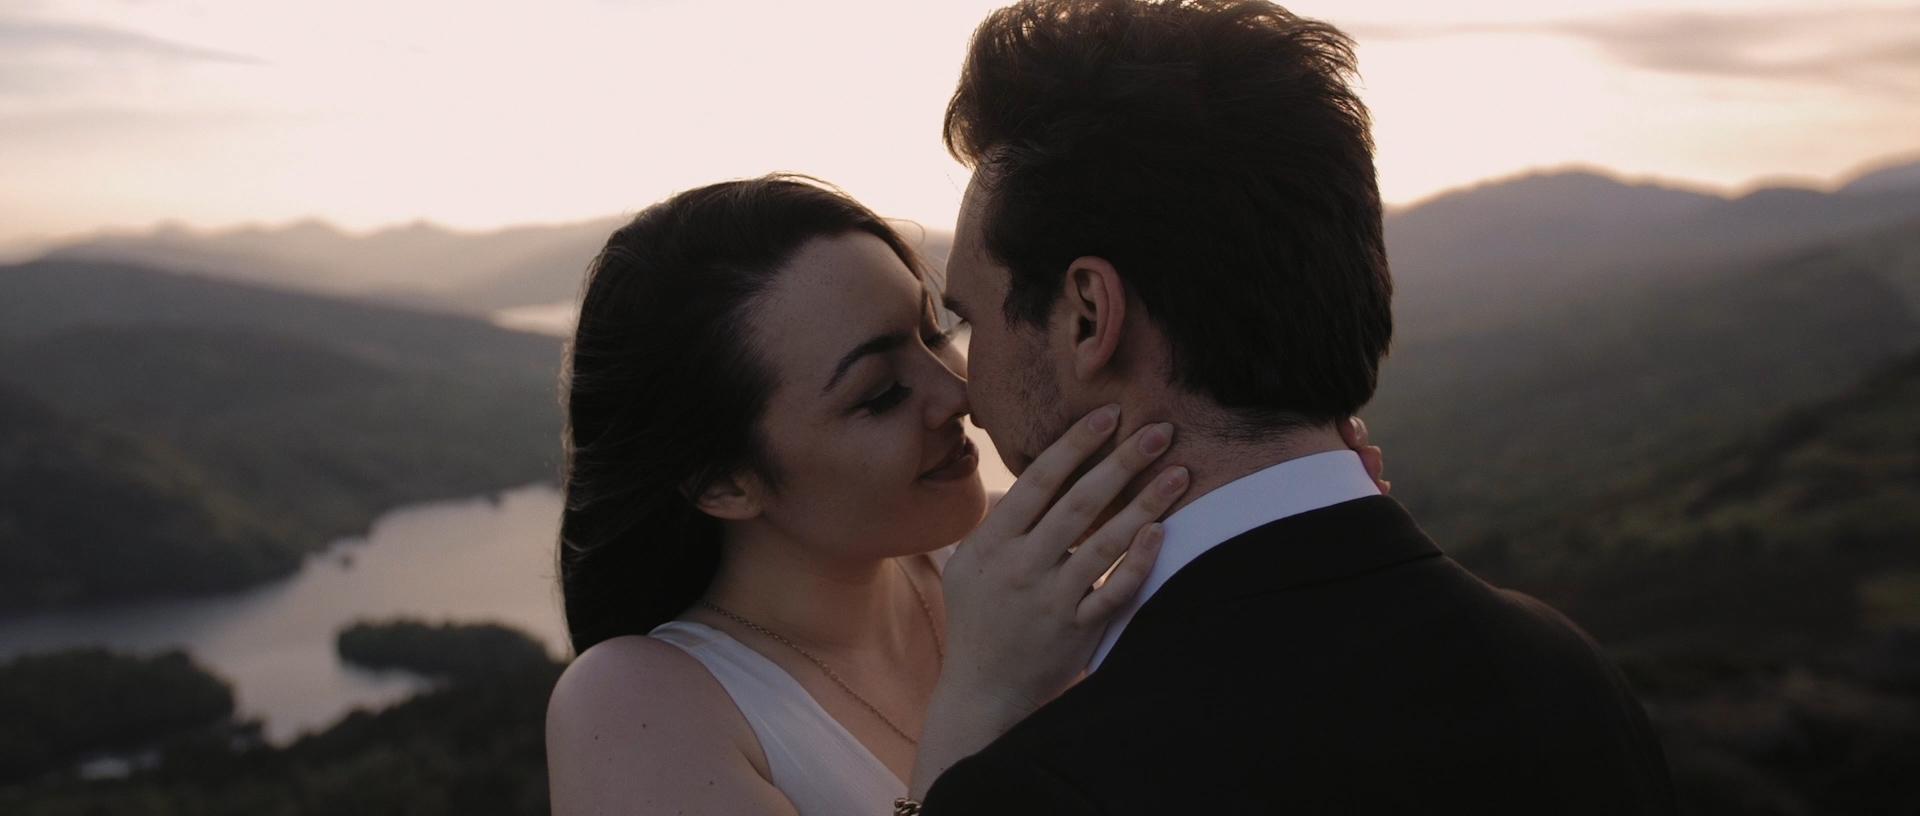 west-on-the-green-wedding-videographer_LL_09.jpg